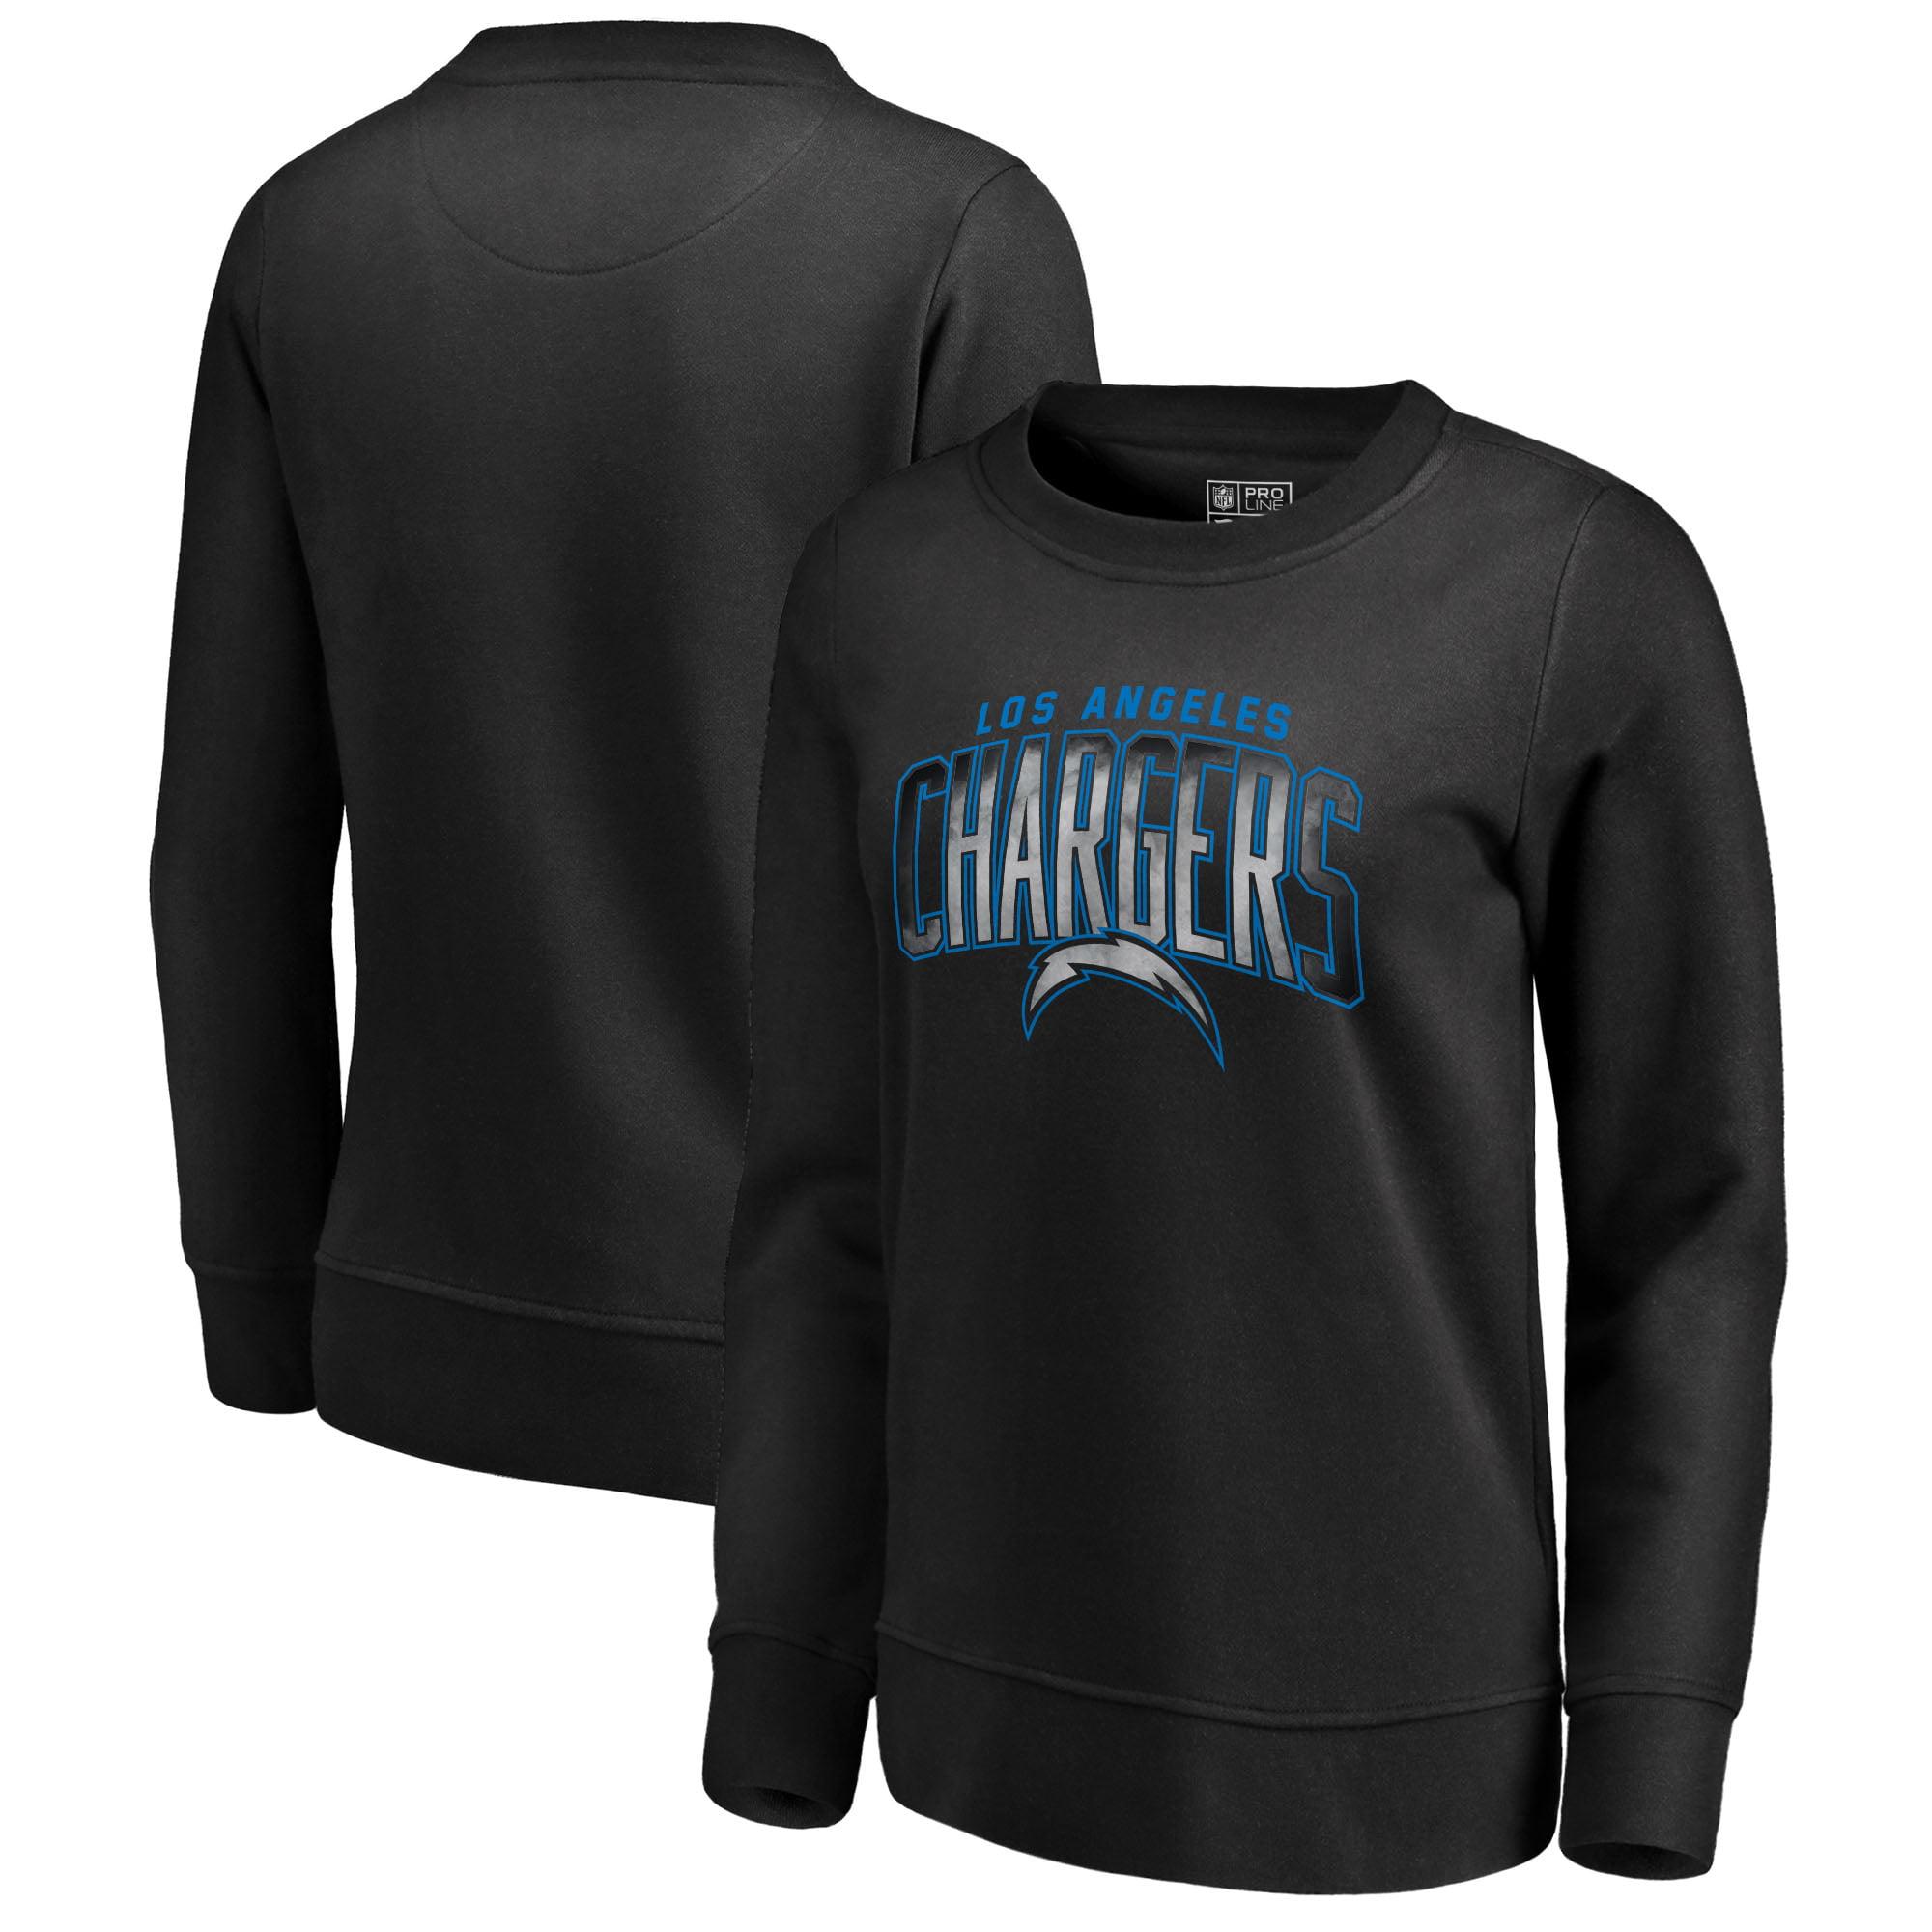 Los Angeles Chargers NFL Pro Line by Fanatics Branded Women's Arch Smoke Crew Neck Fleece Sweatshirt - Black